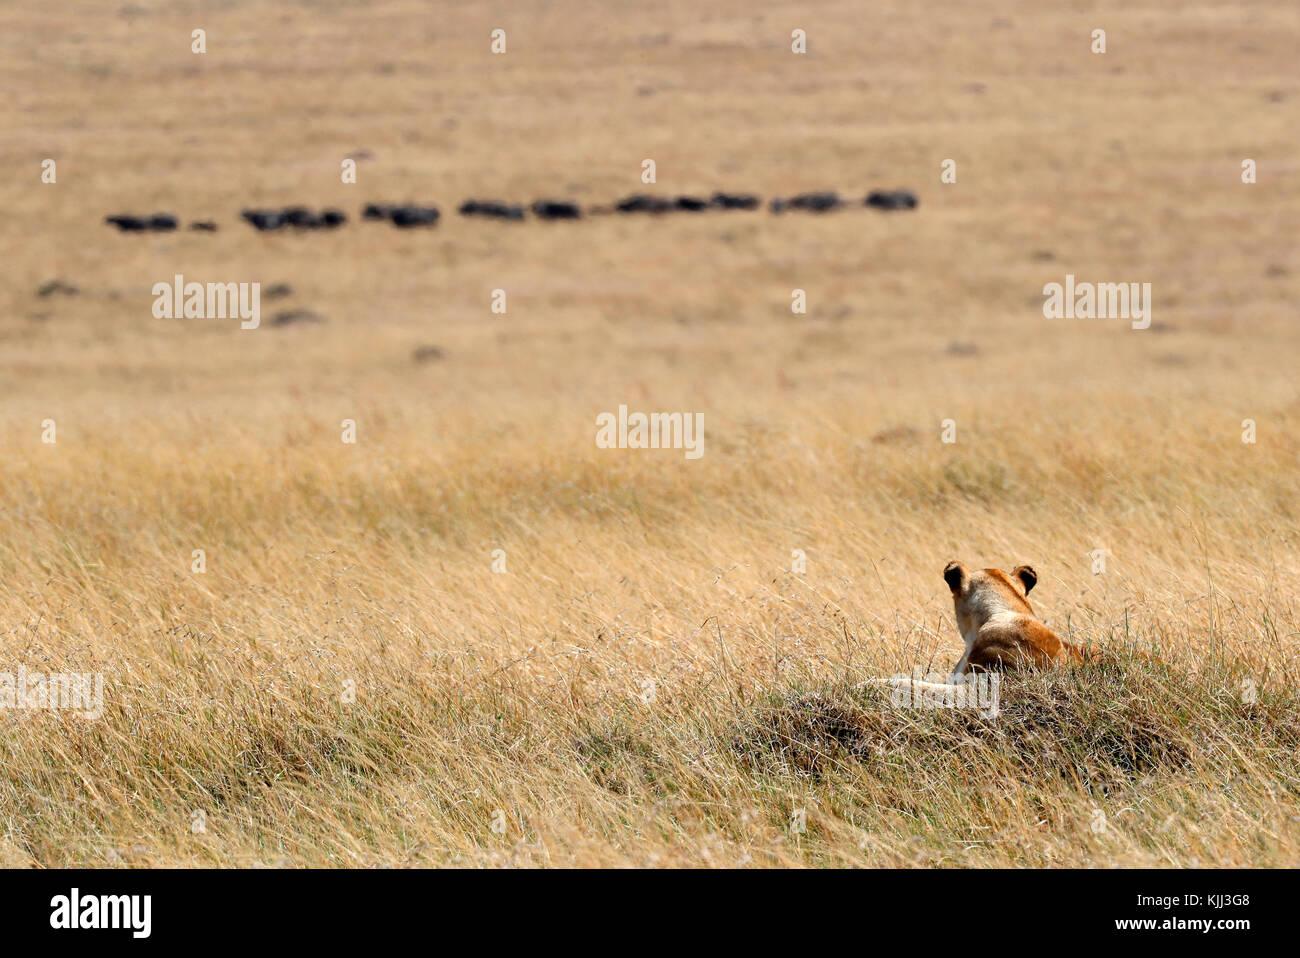 Lioness (Panthera leo) looking at buffalos herd. Masai Mara game reserve. Kenya. - Stock Image